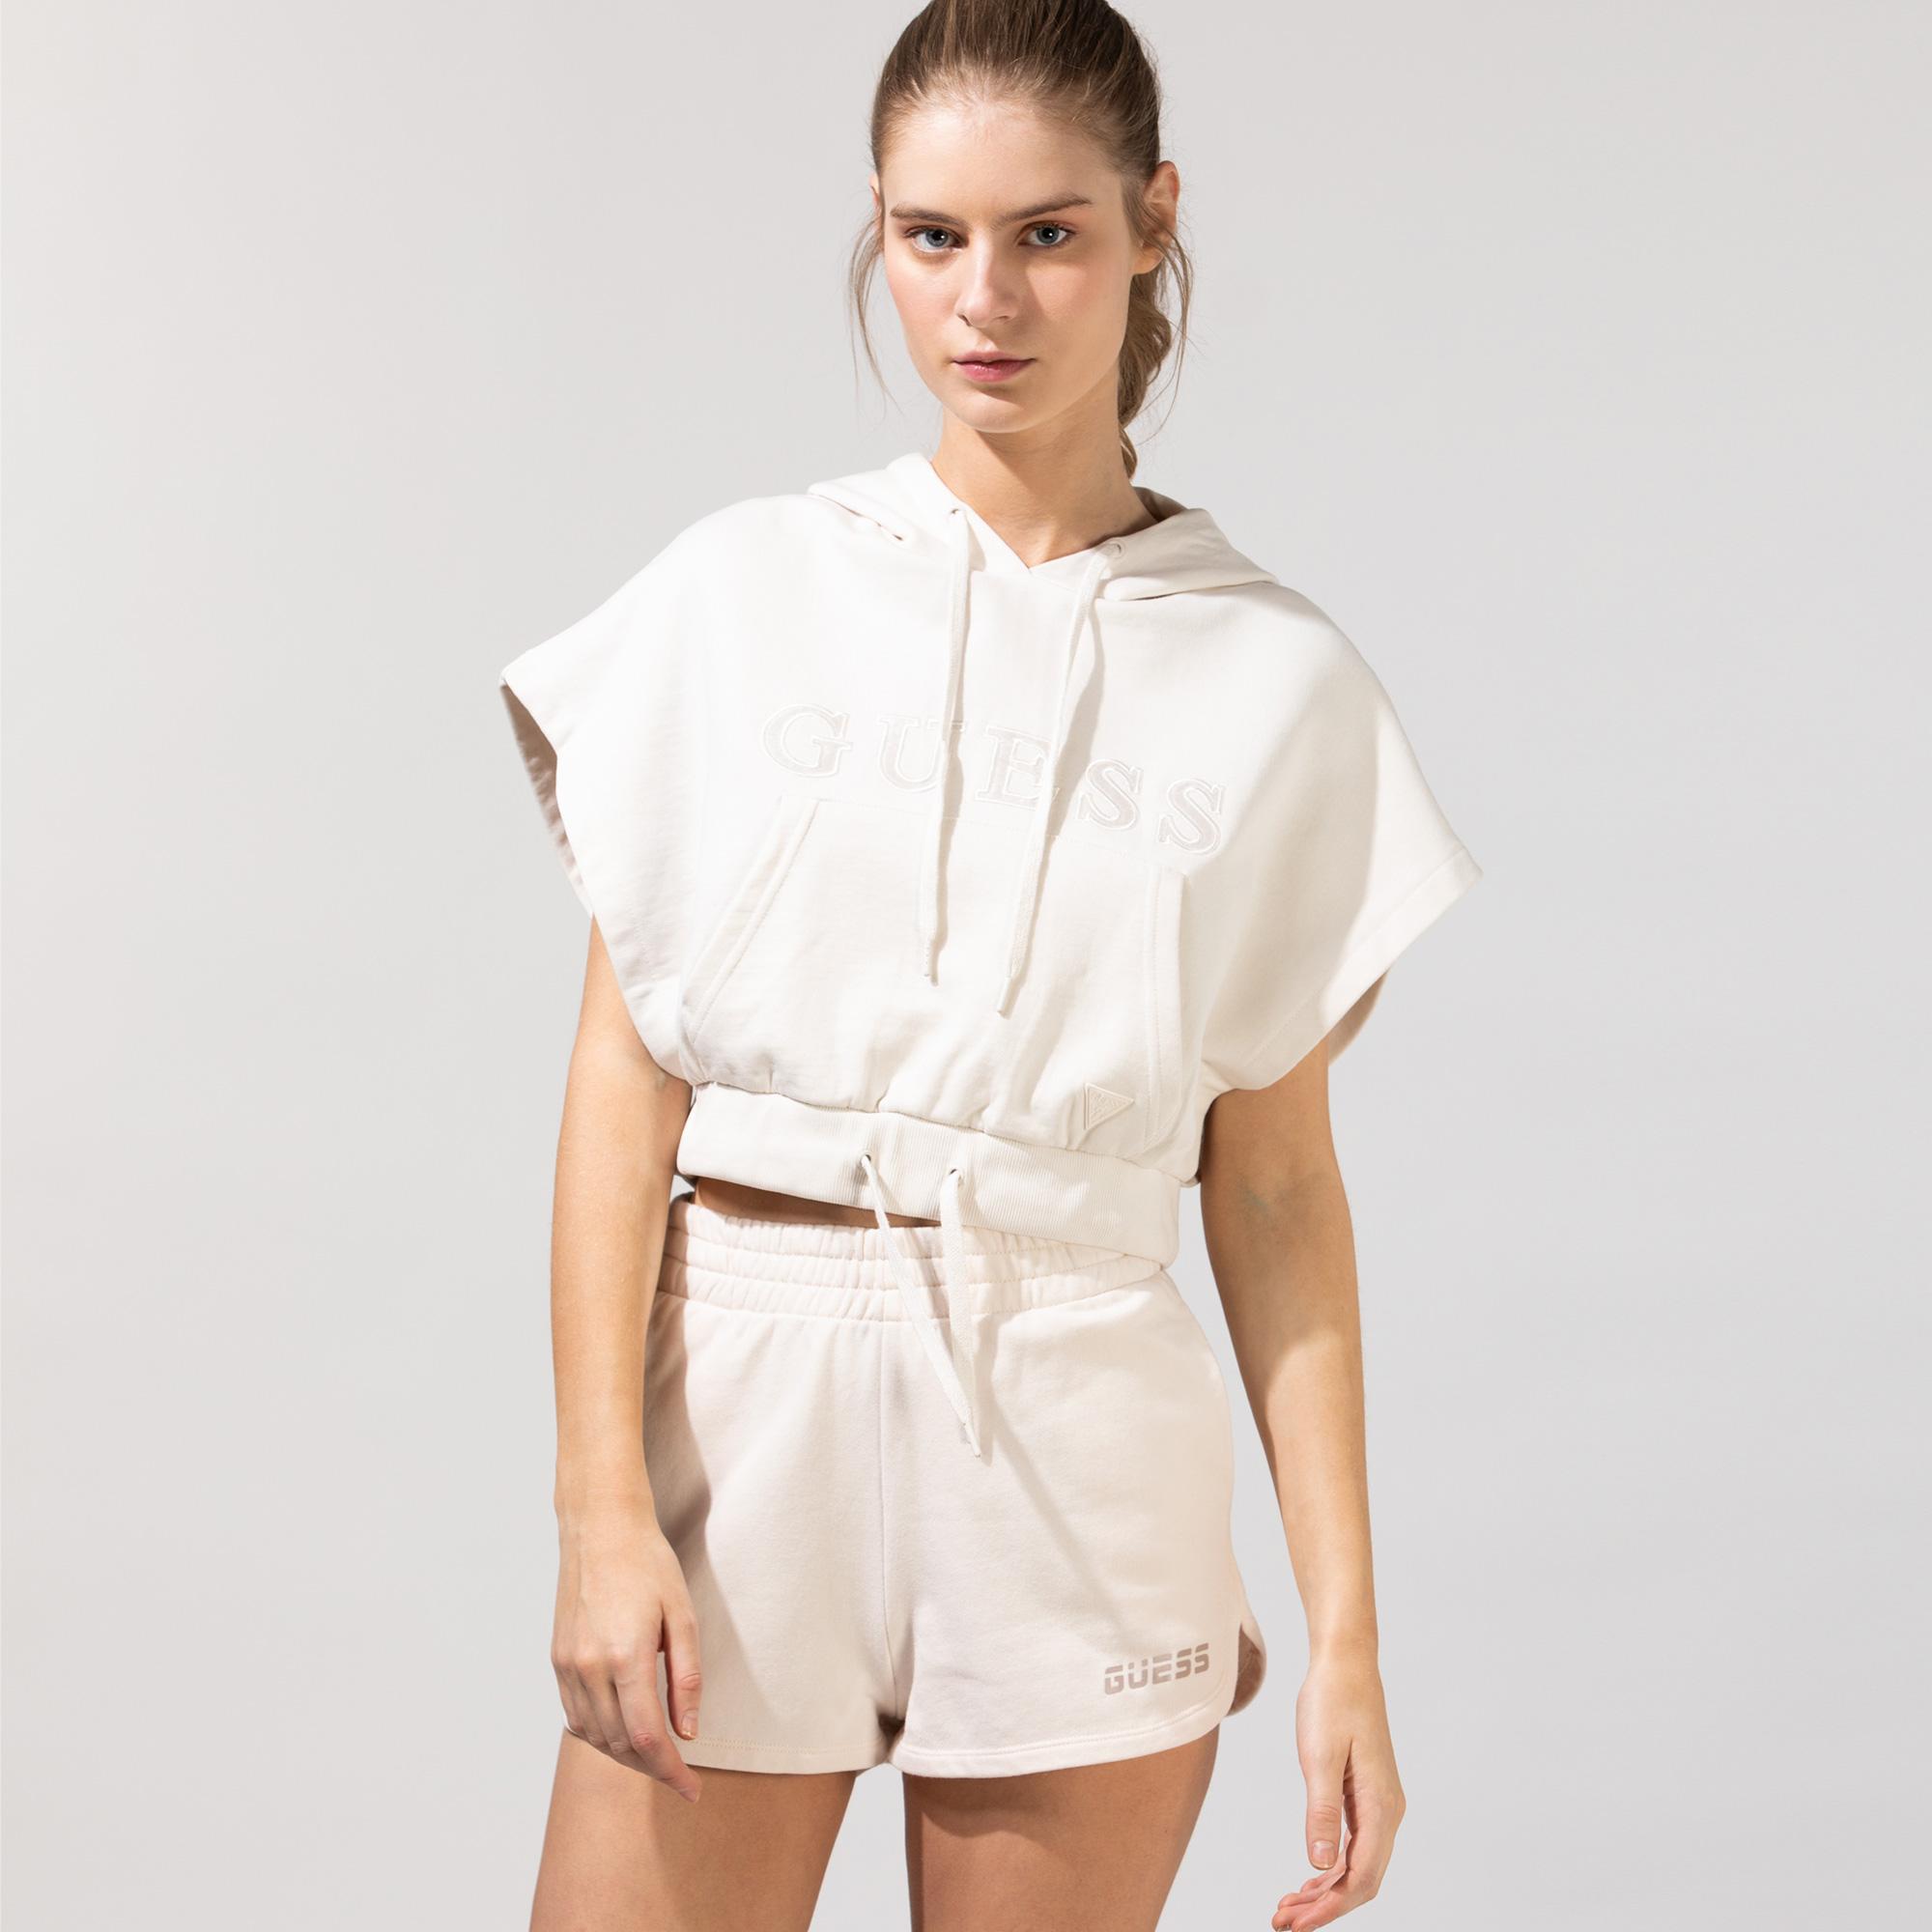 Guess Kadın Beyaz Sweatshirt